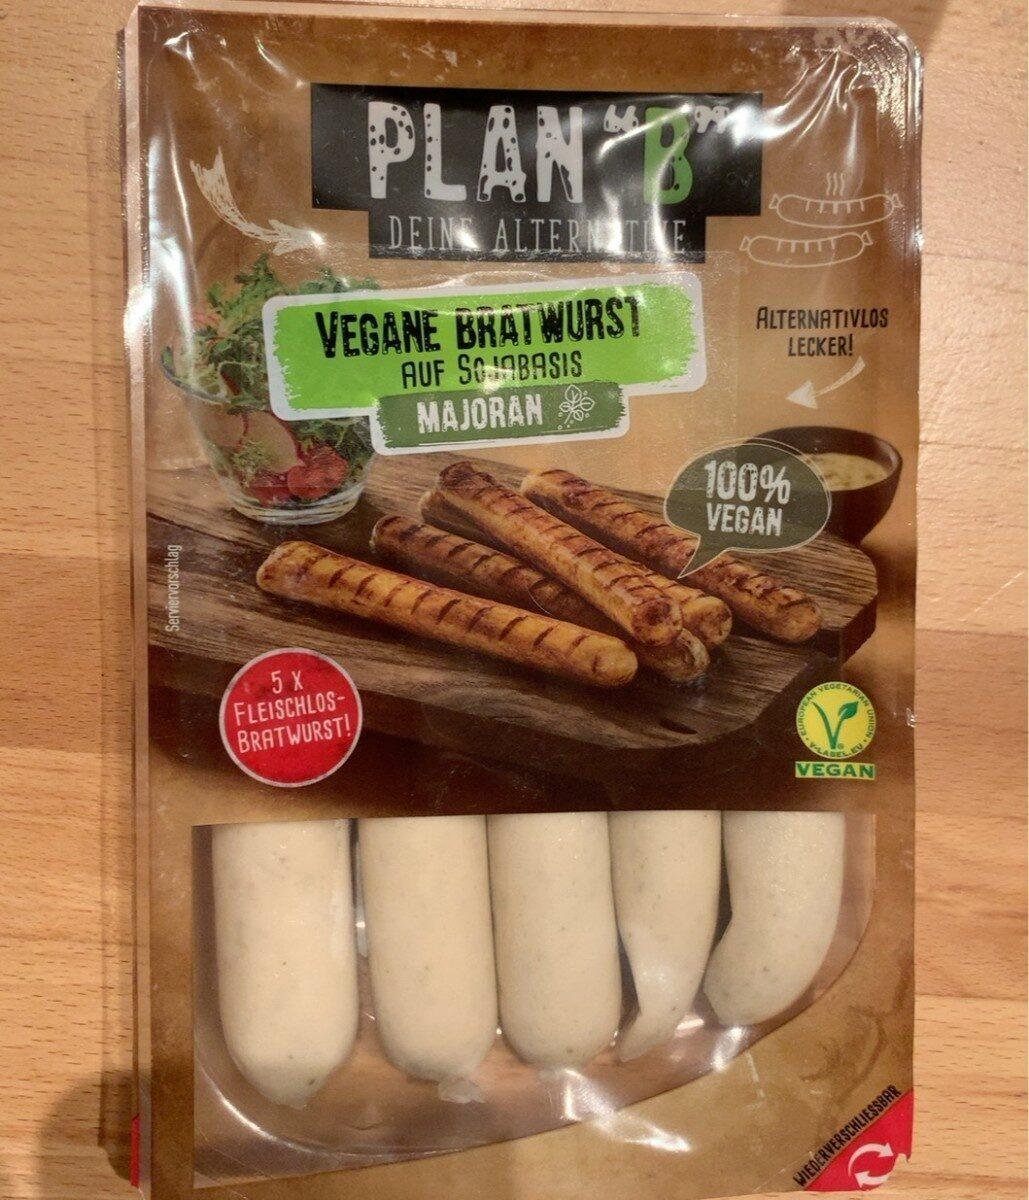 veggie bratwurst mit majoran - Produkt - de